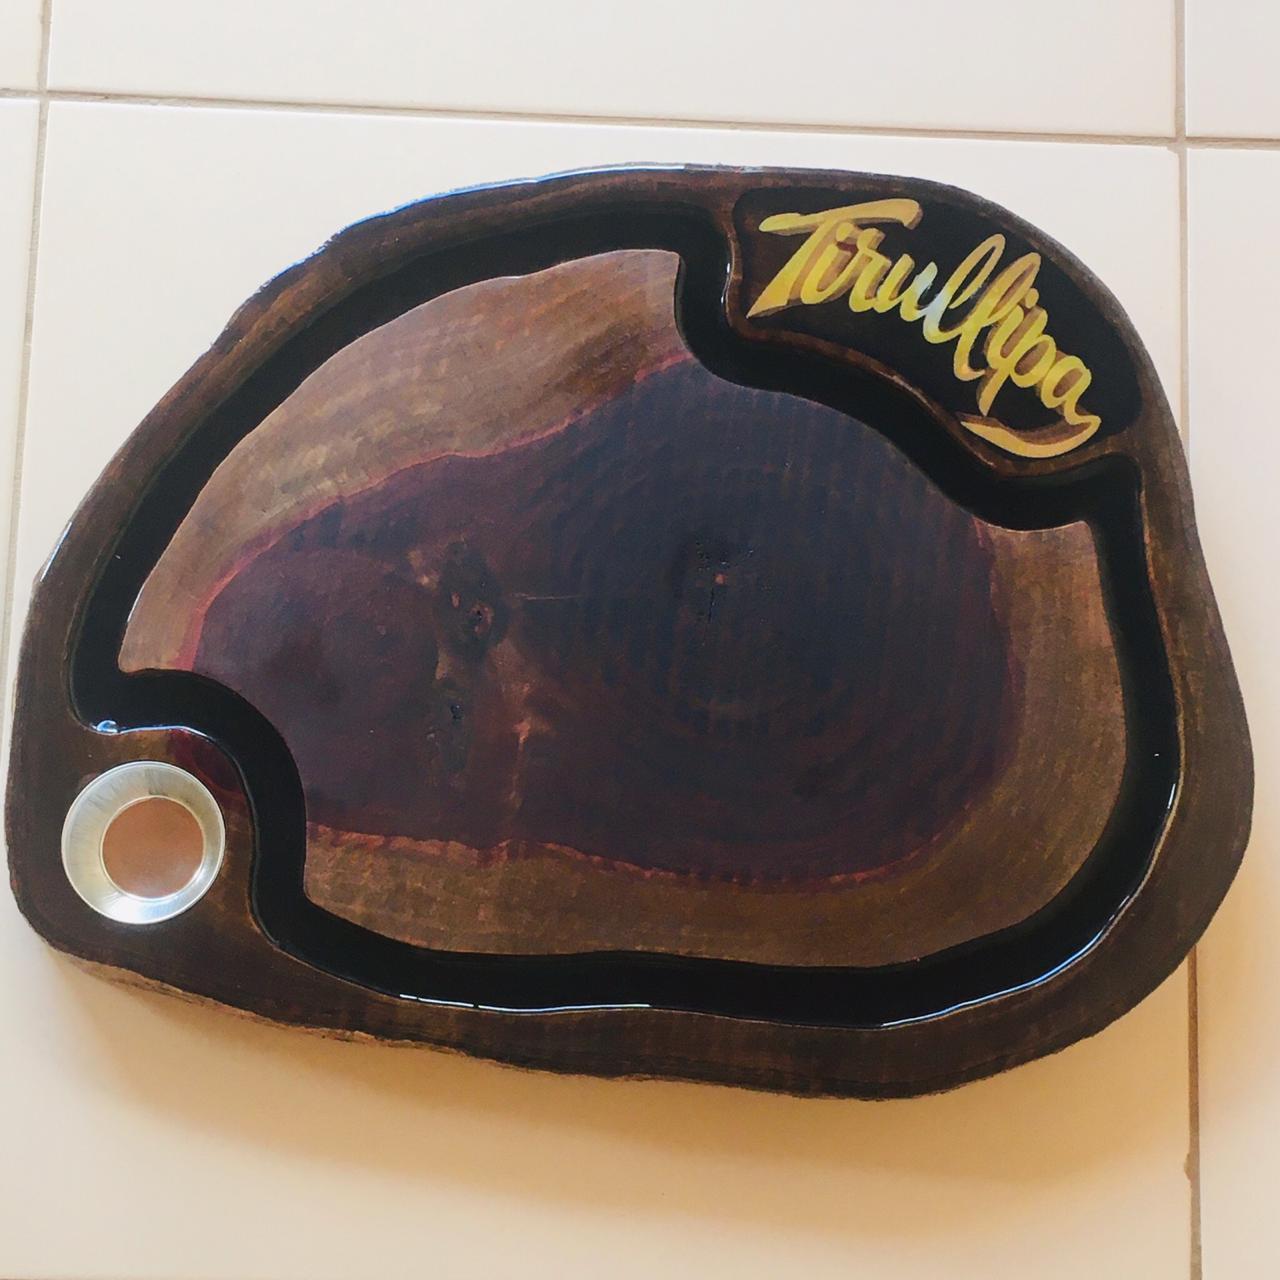 Tabua de Cortar Carne Rustica Personalizada Artesanal